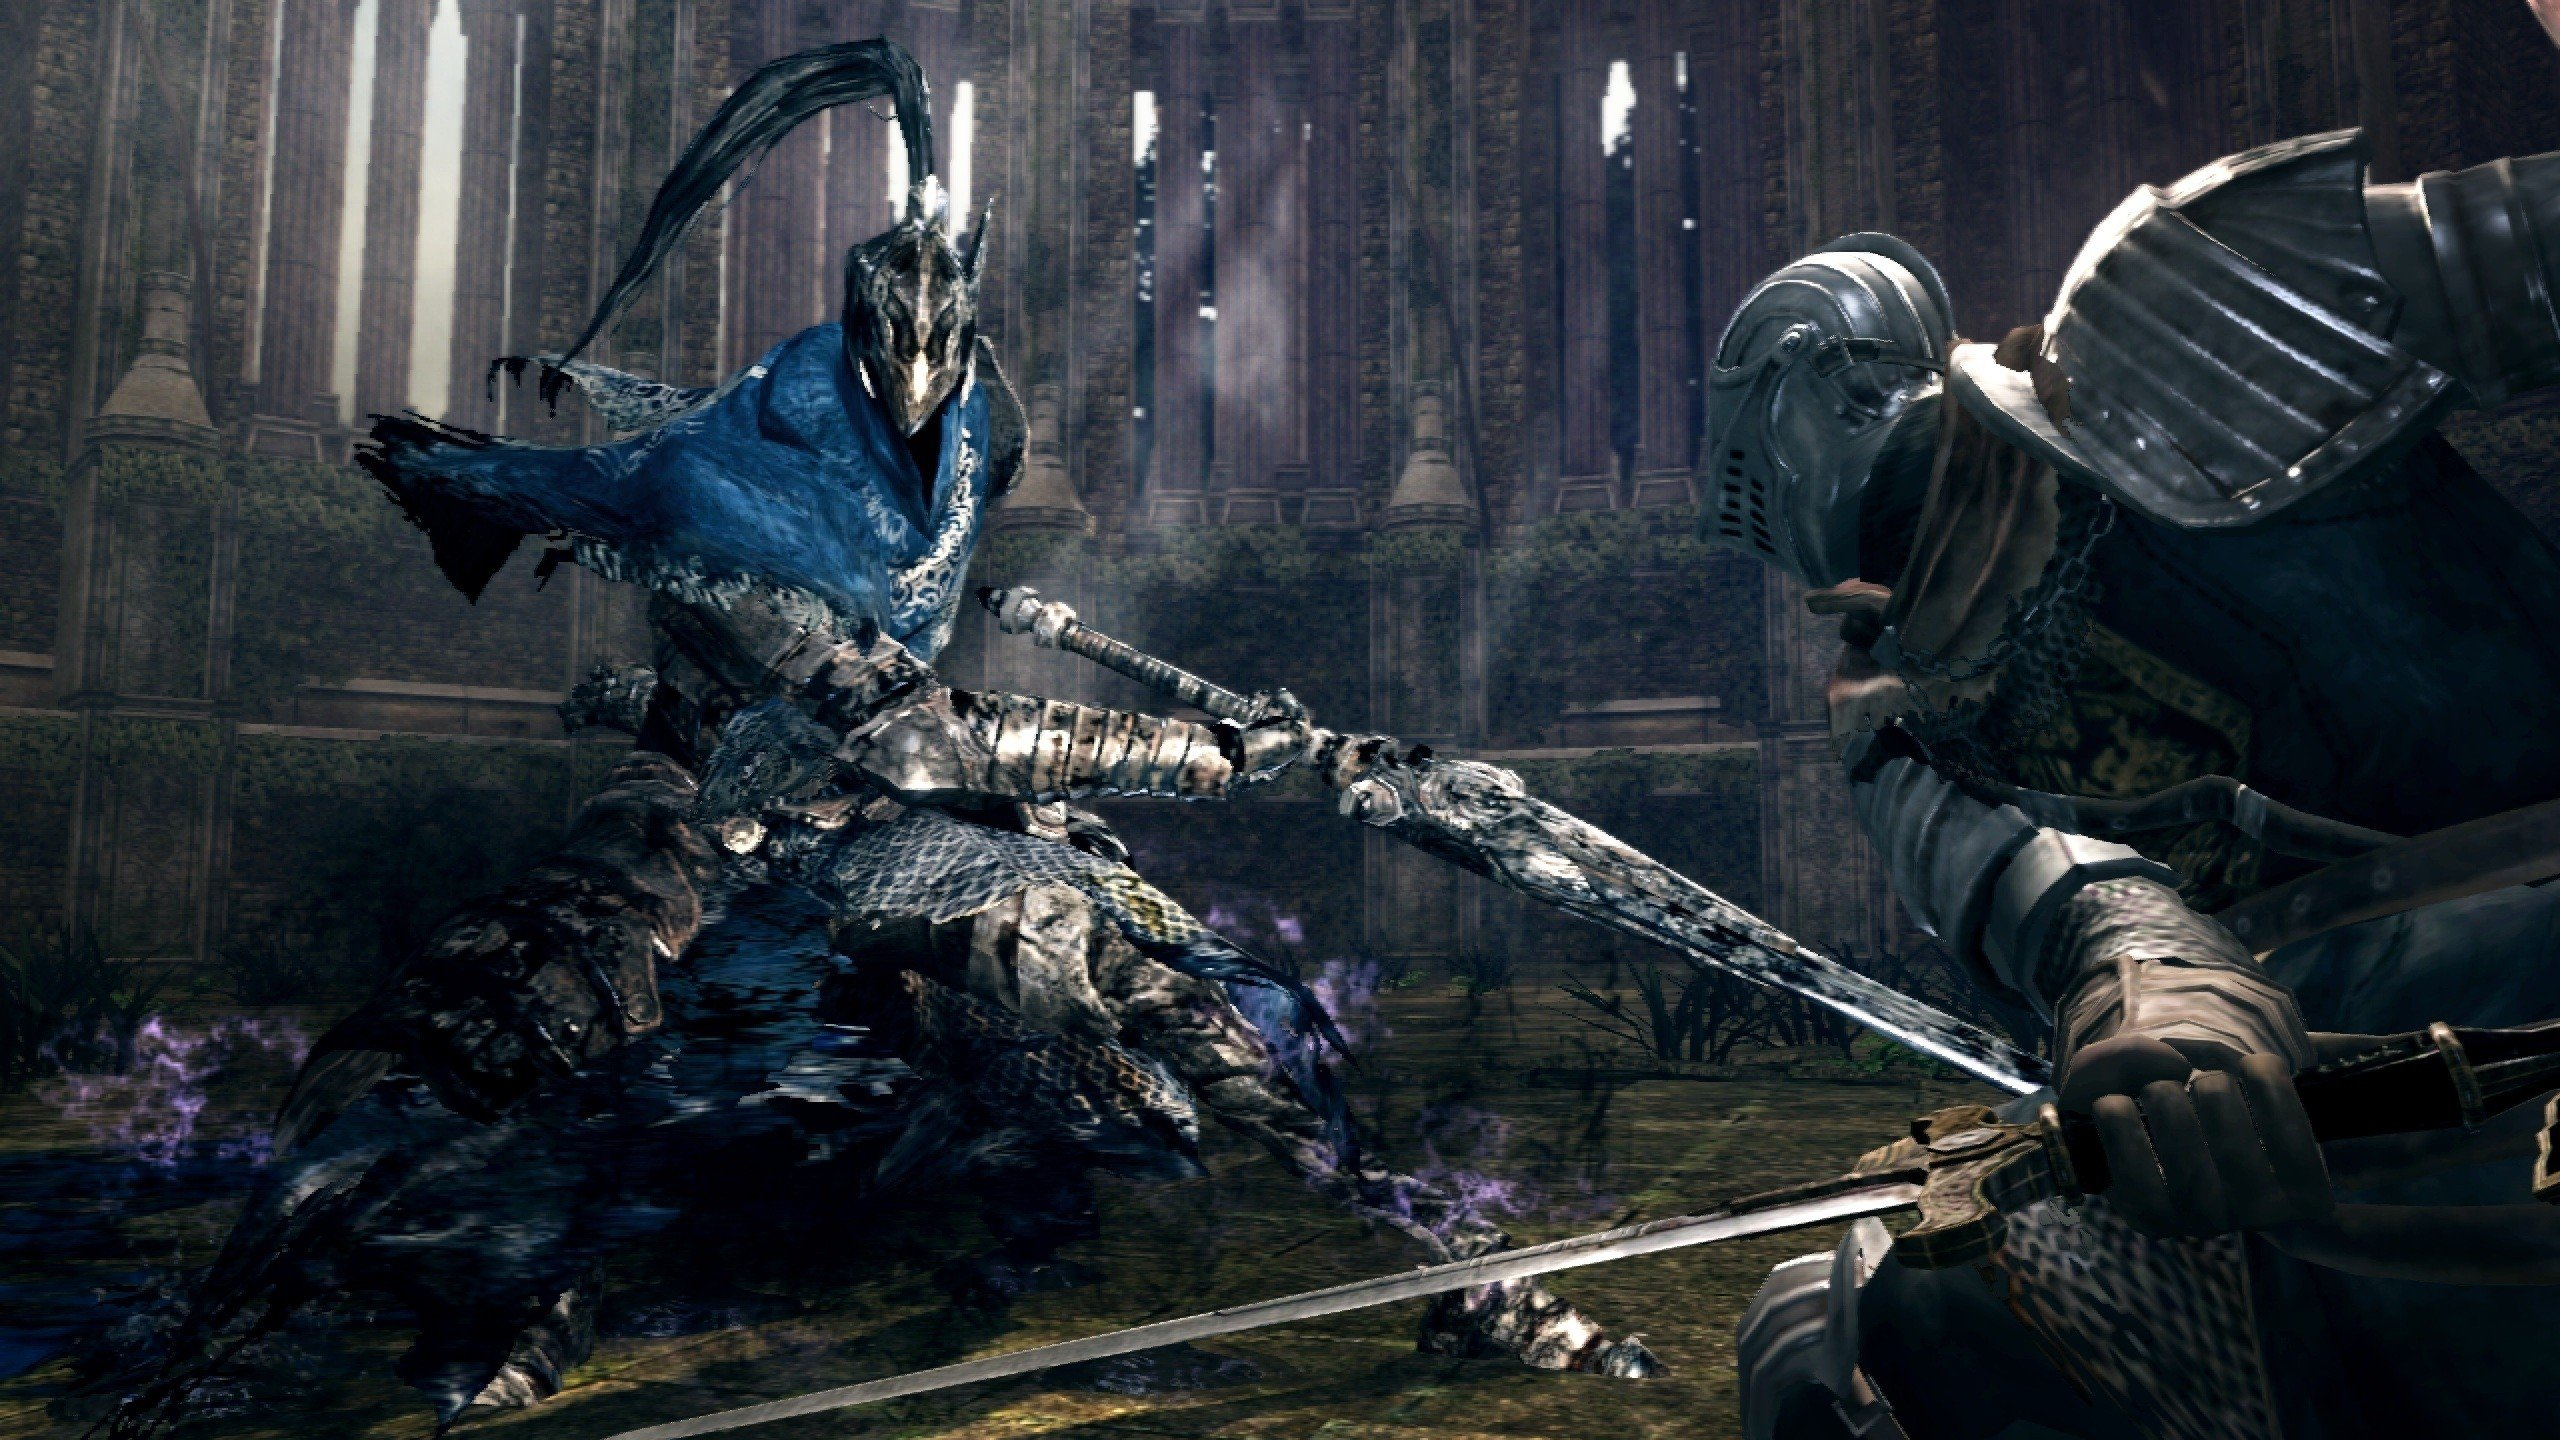 Dark Souls Artorias Abyss Hd Wallpapers Desktop And Mobile